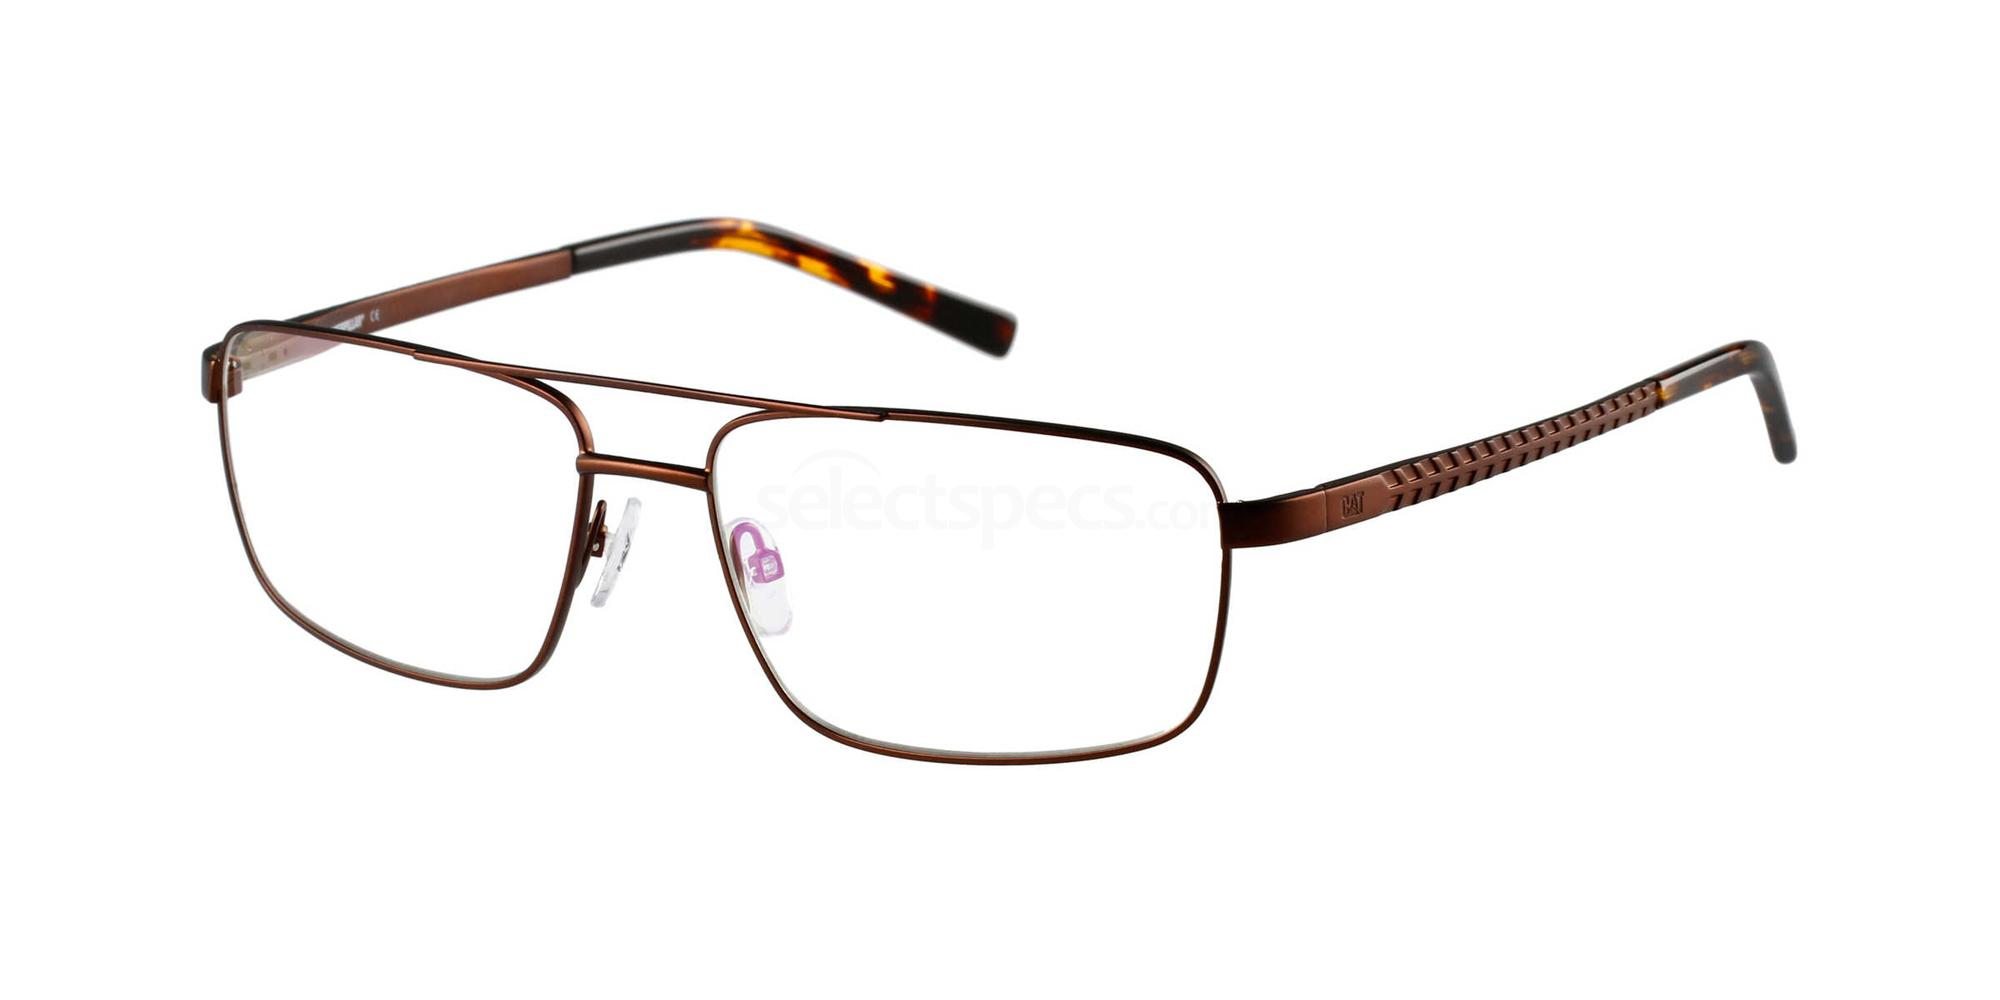 003 CTO-N02 Glasses, CAT